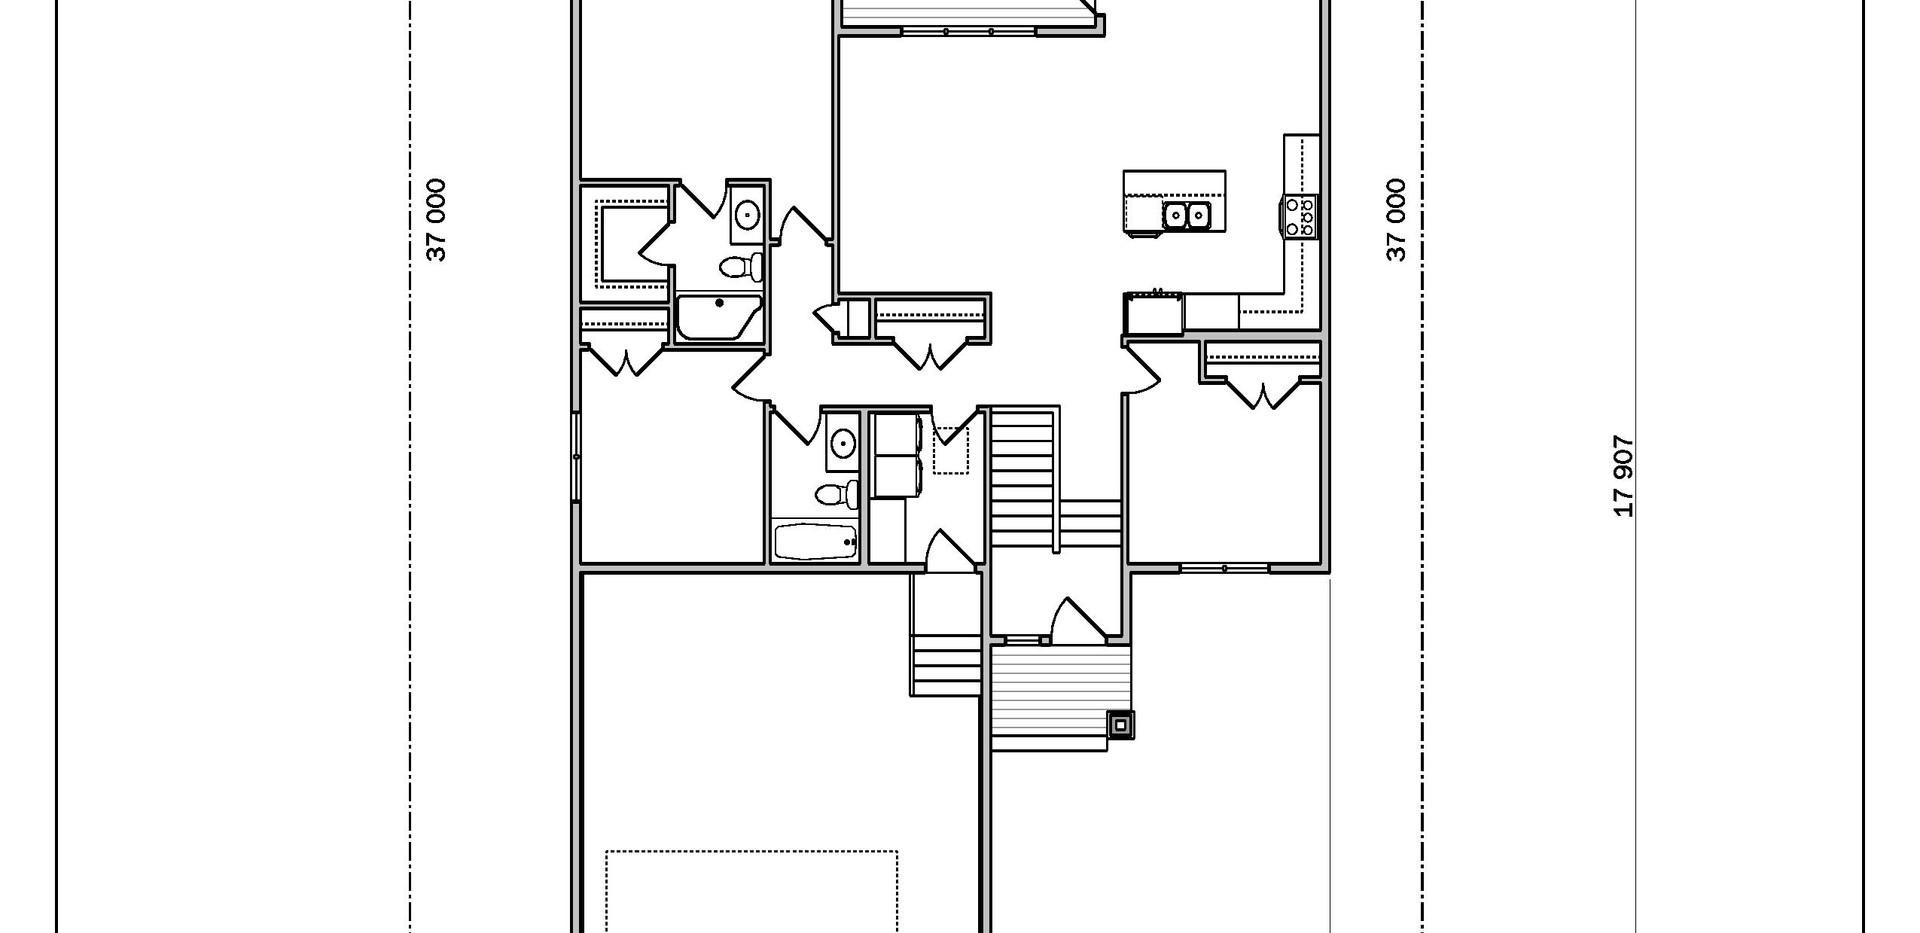 17 Vireo Avenue - Site Plan - 1-29-21-pa